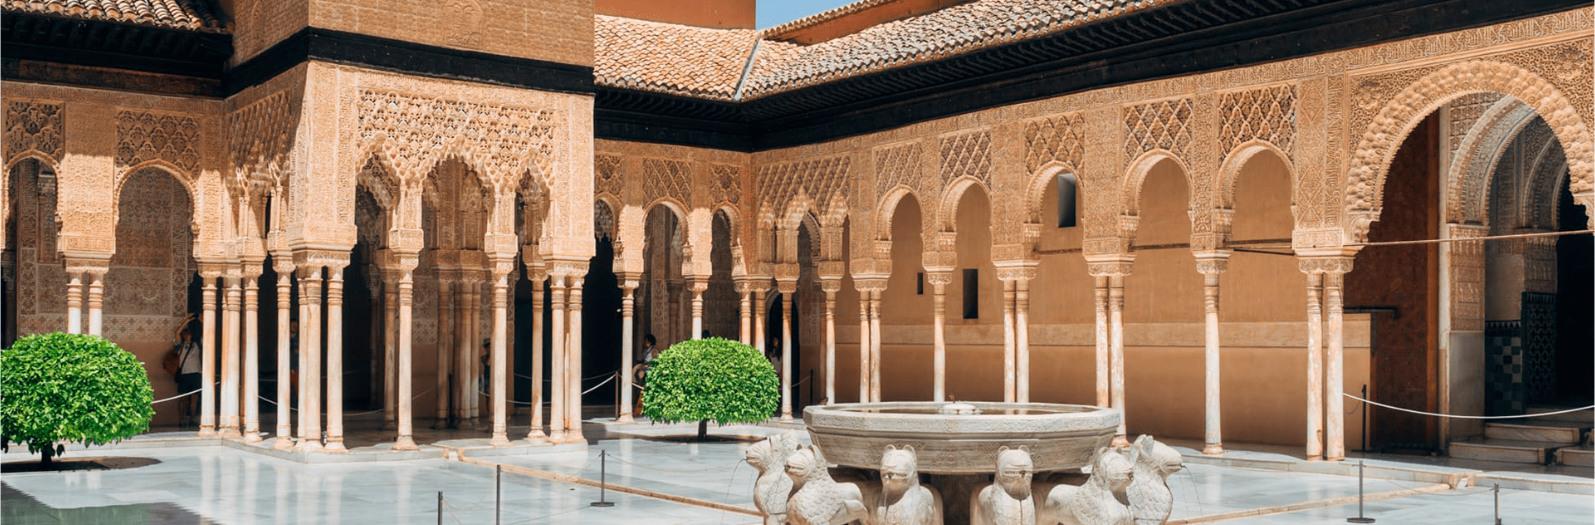 Alhambra de Granada Adarve Travel